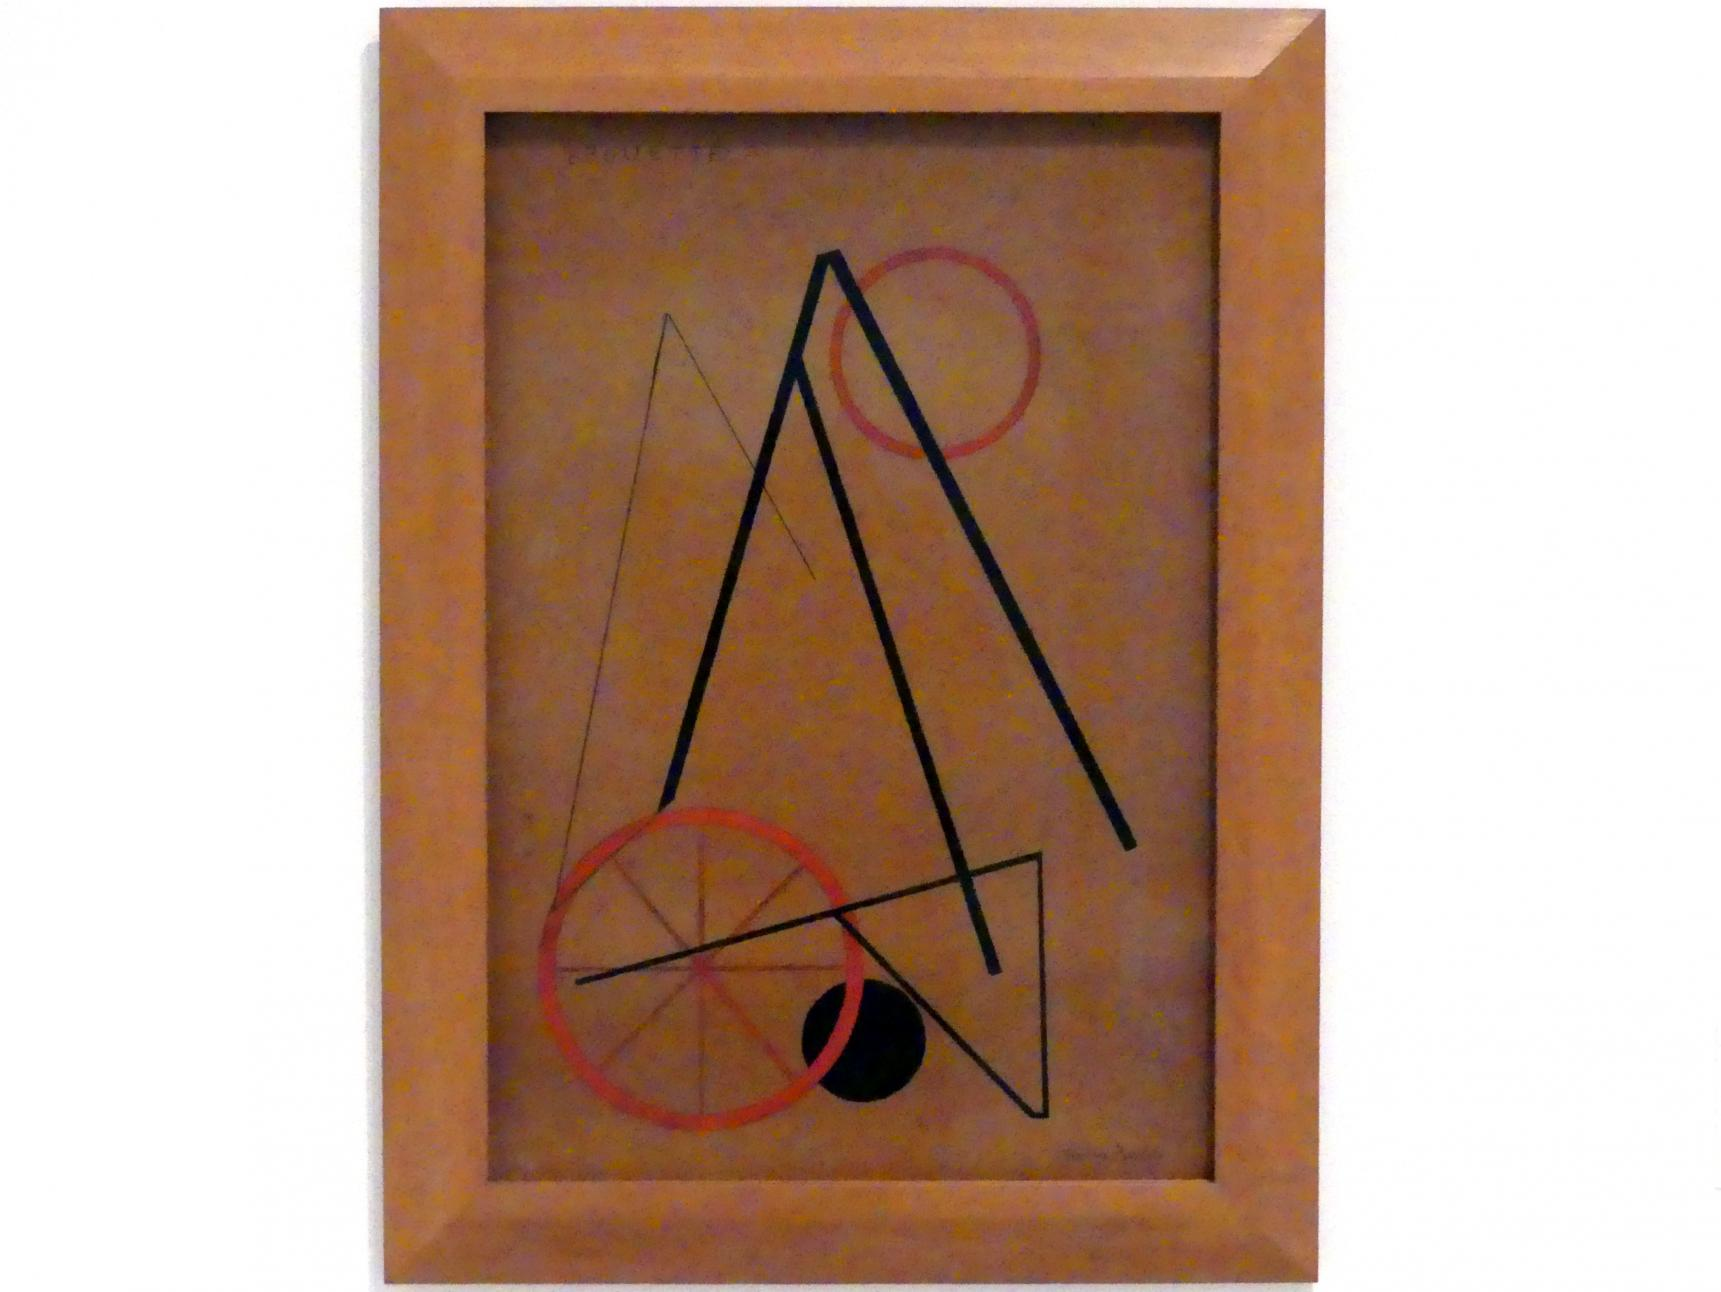 Francis Picabia: Schubkarre, um 1922